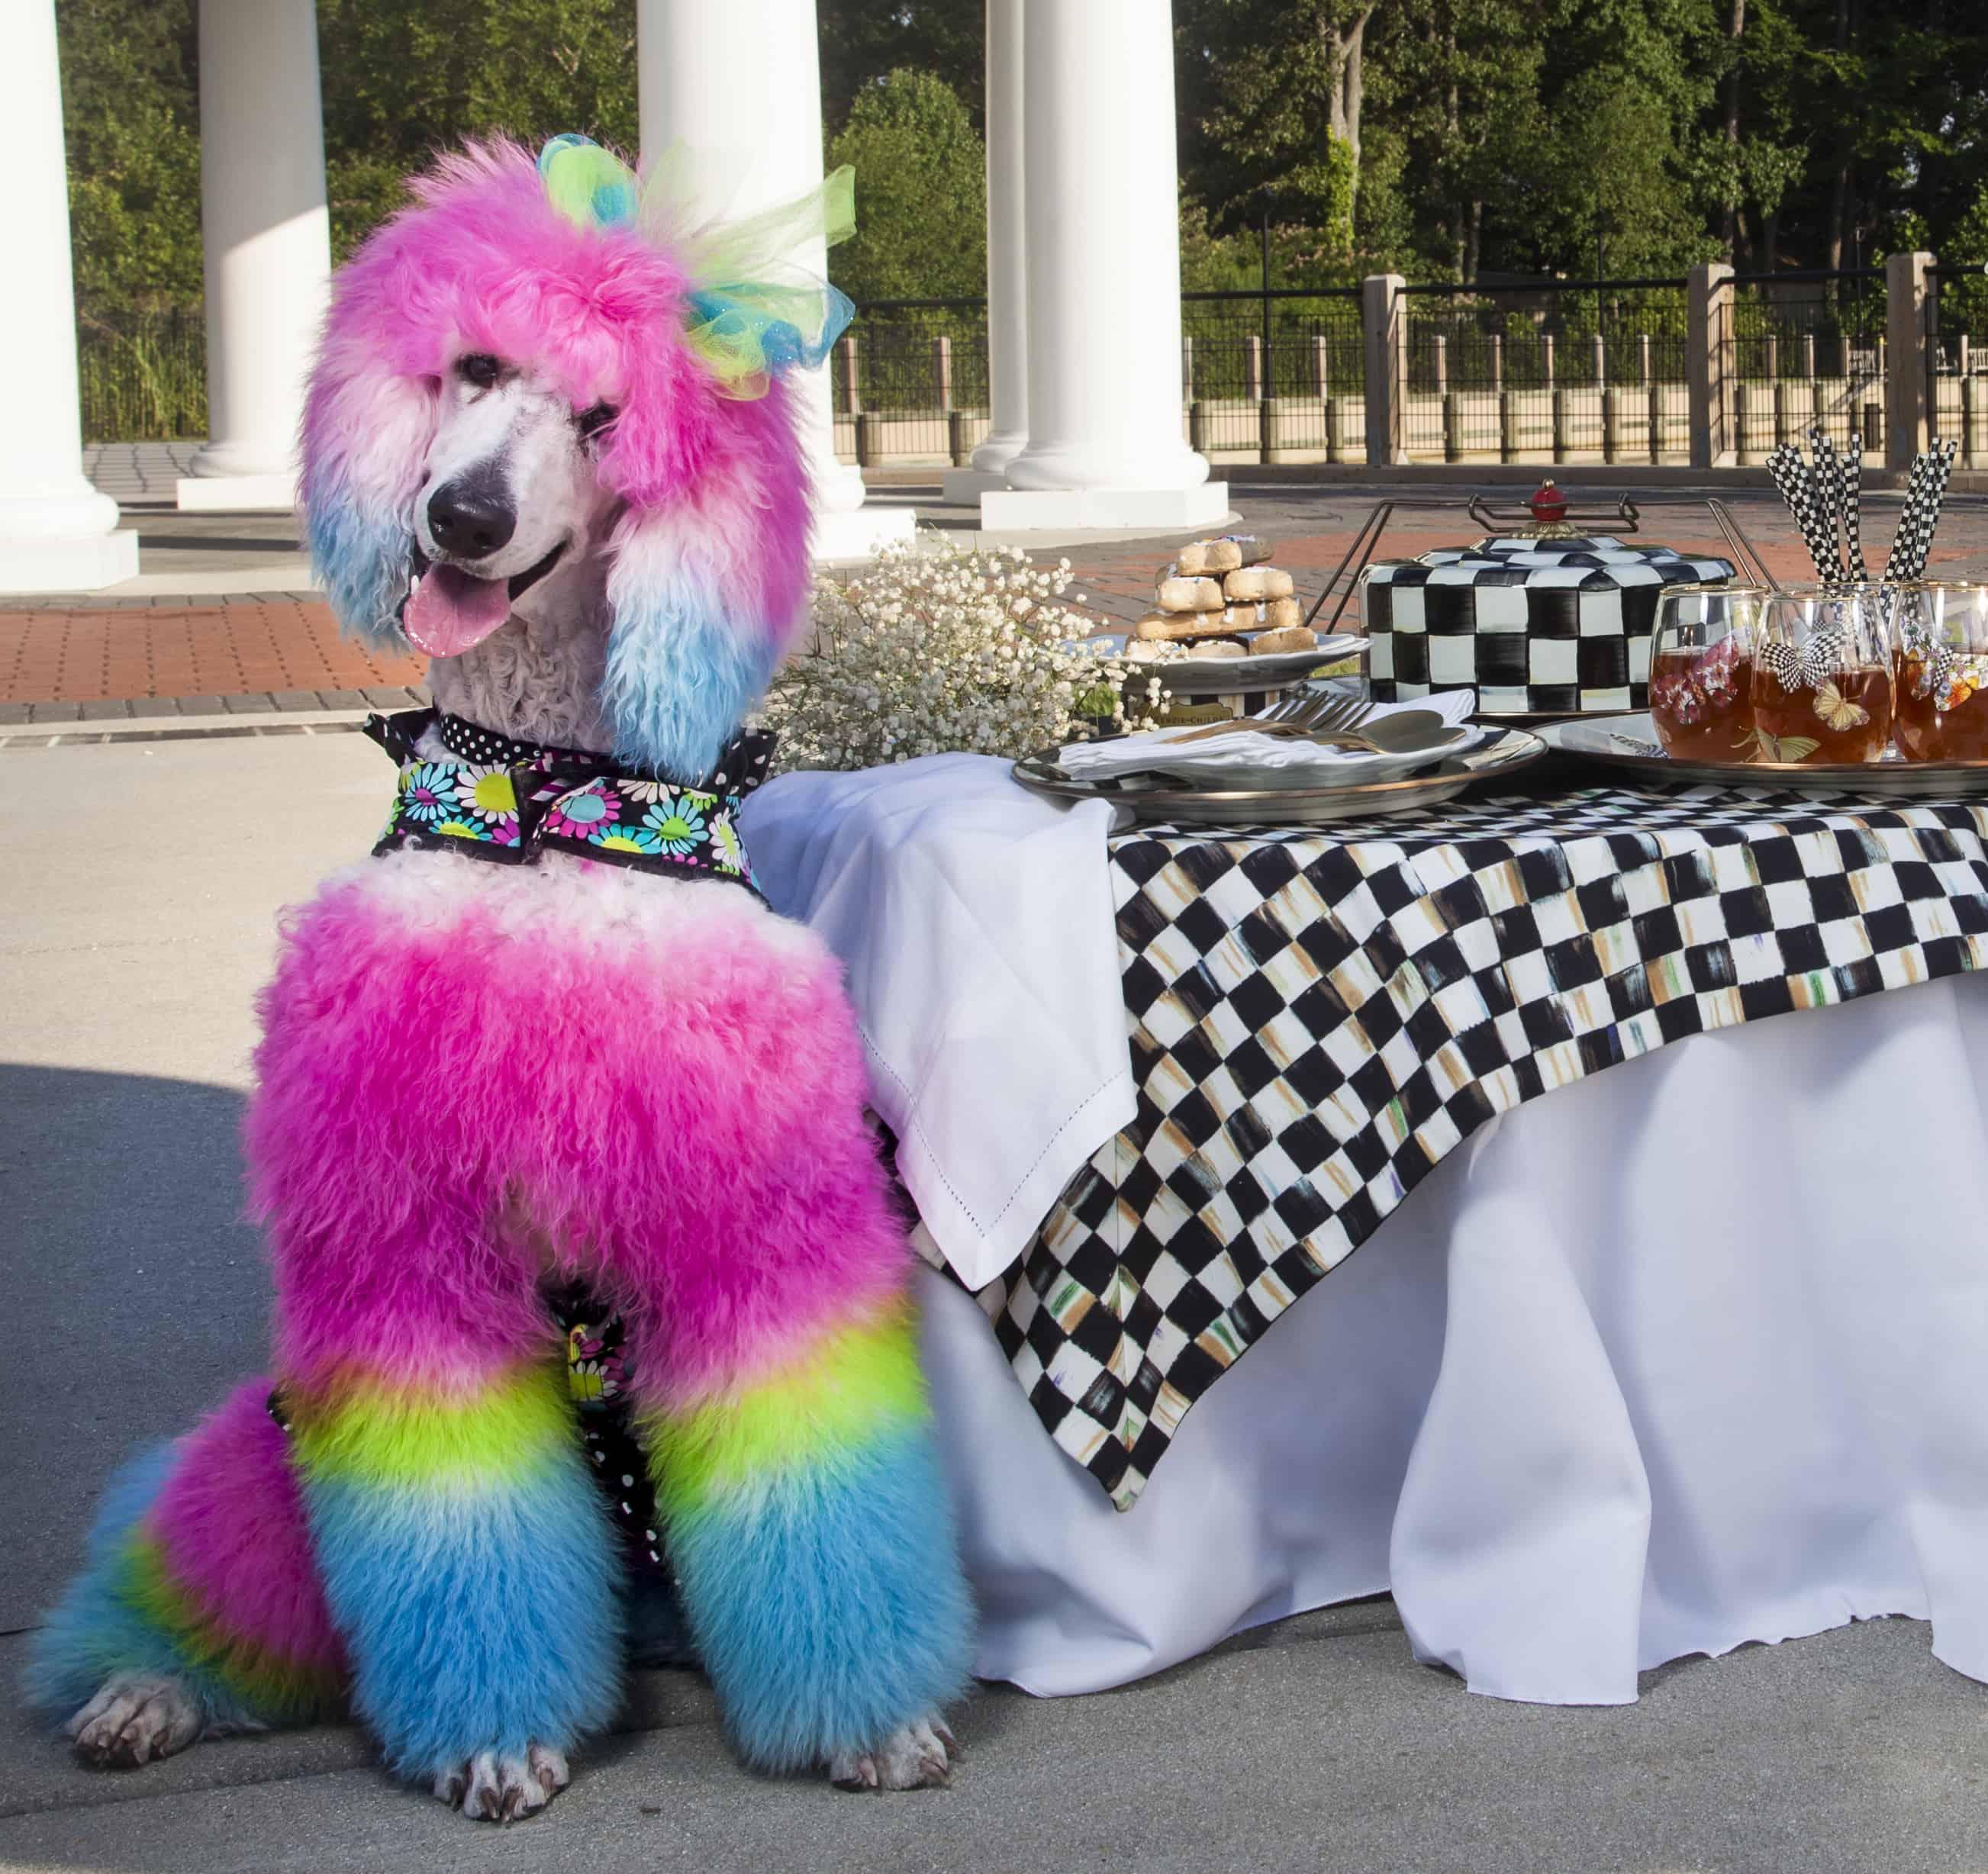 rainbow poodle